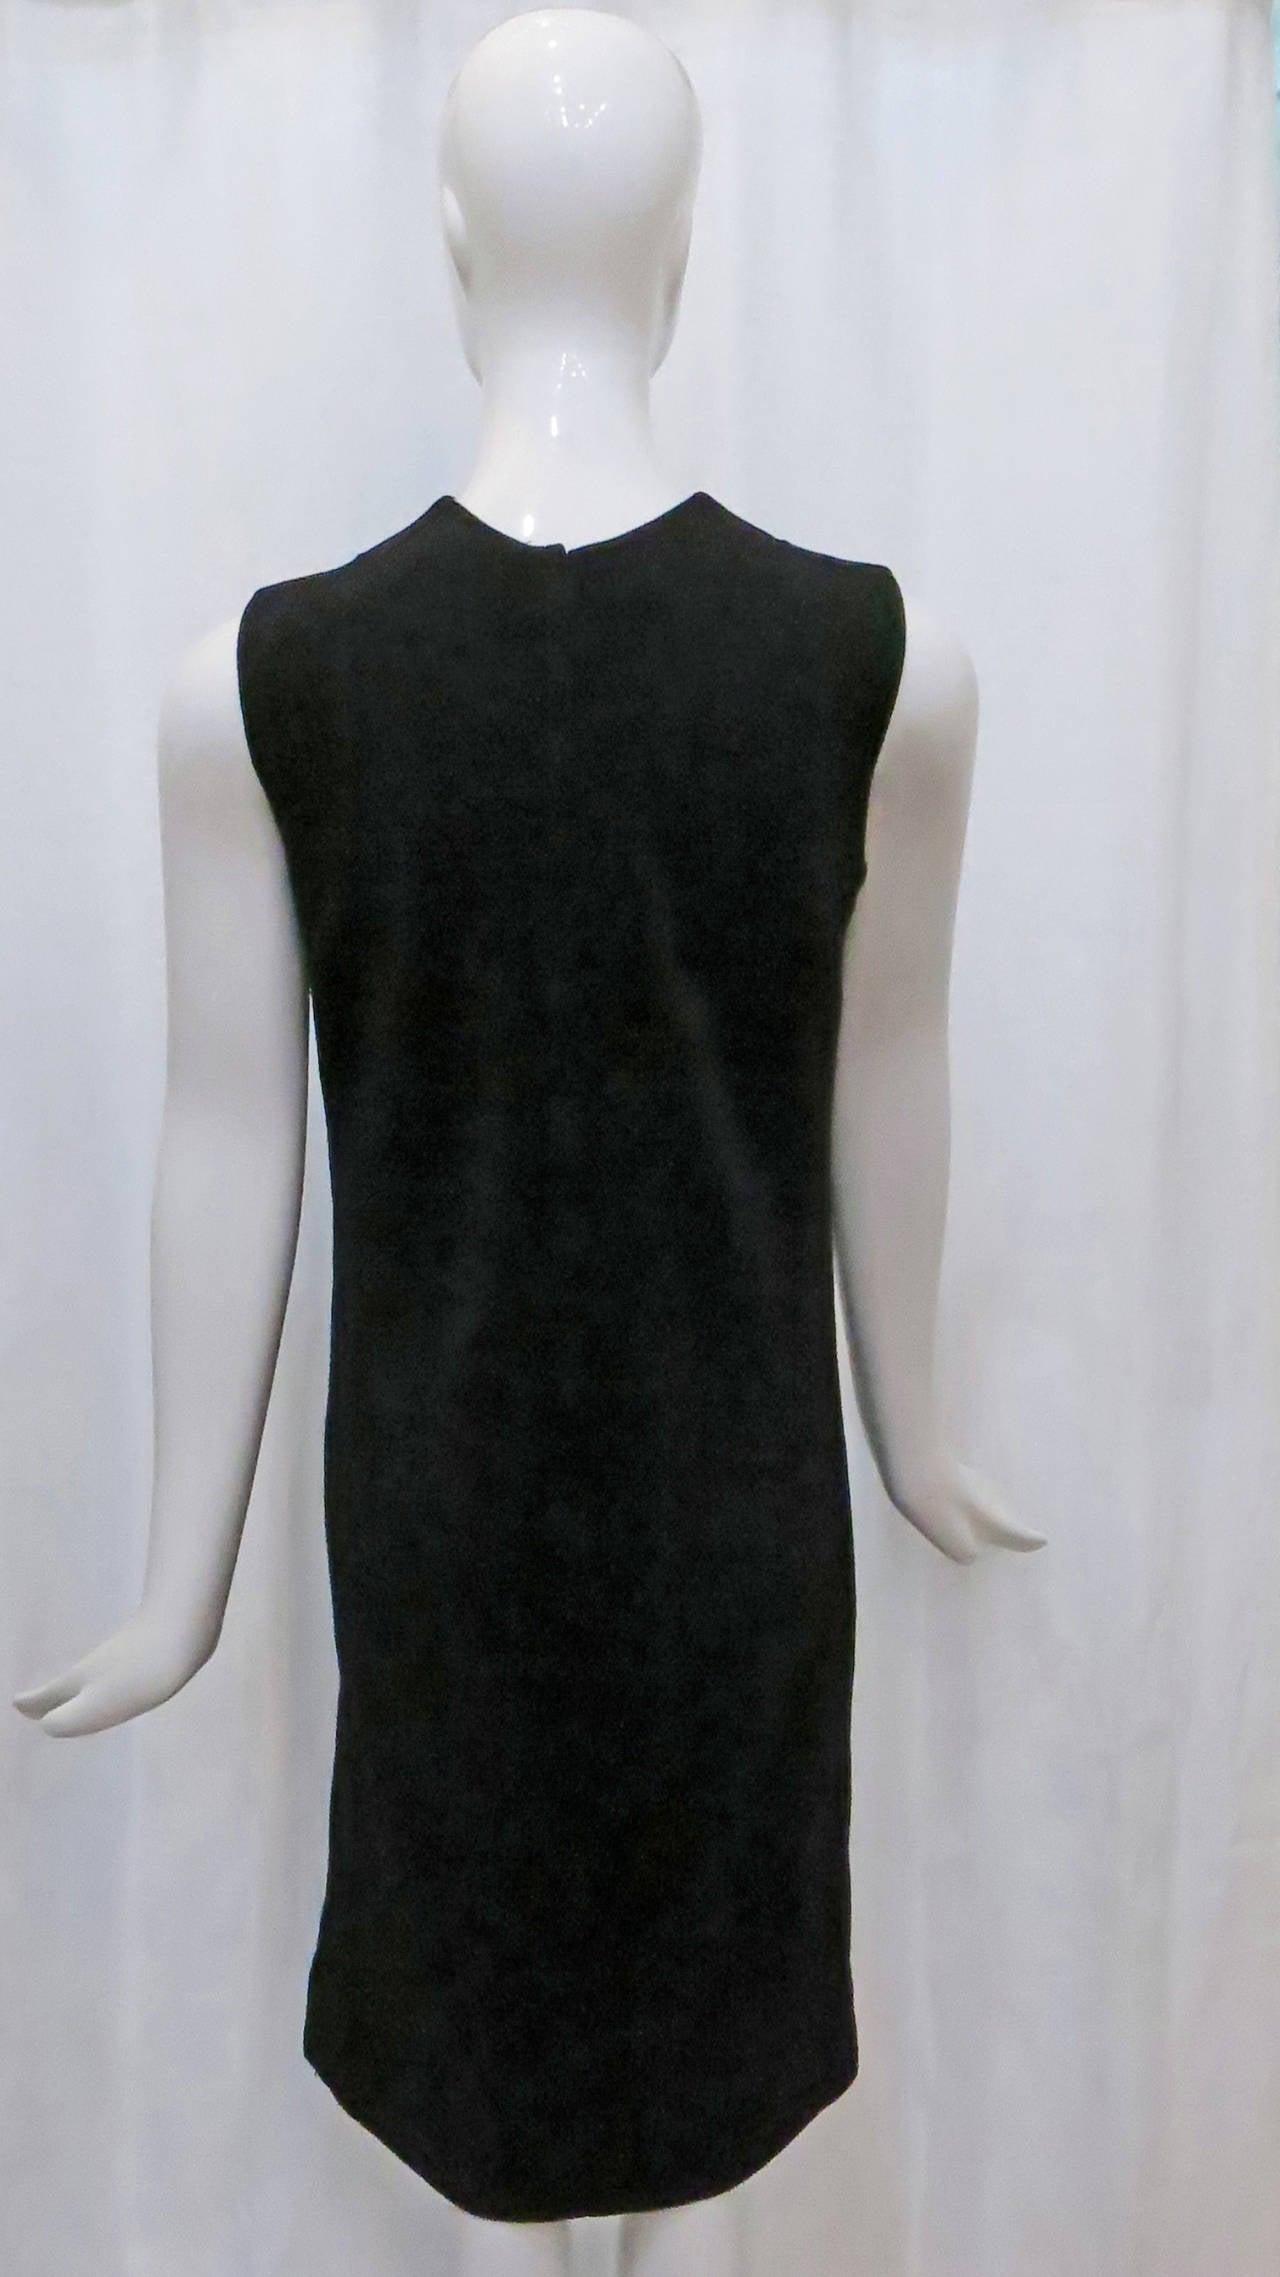 1970s Rudi Gernreich Shimmering Black Knit Dress 4